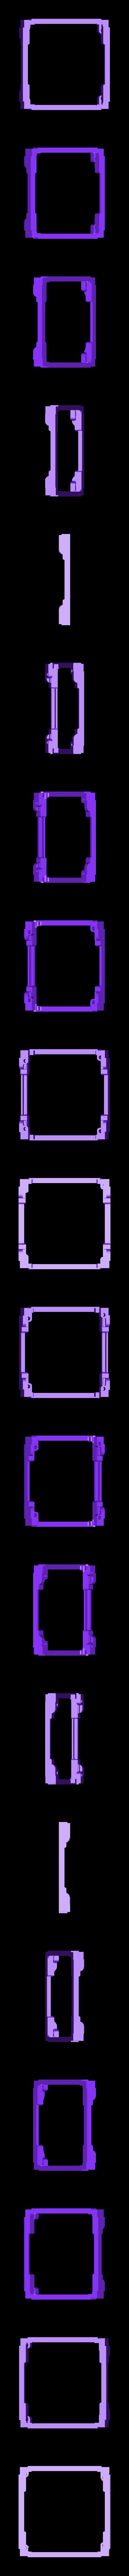 Frame_LowerPlate.stl Download free STL file ArduSat • 3D printing template, Loustic3D888